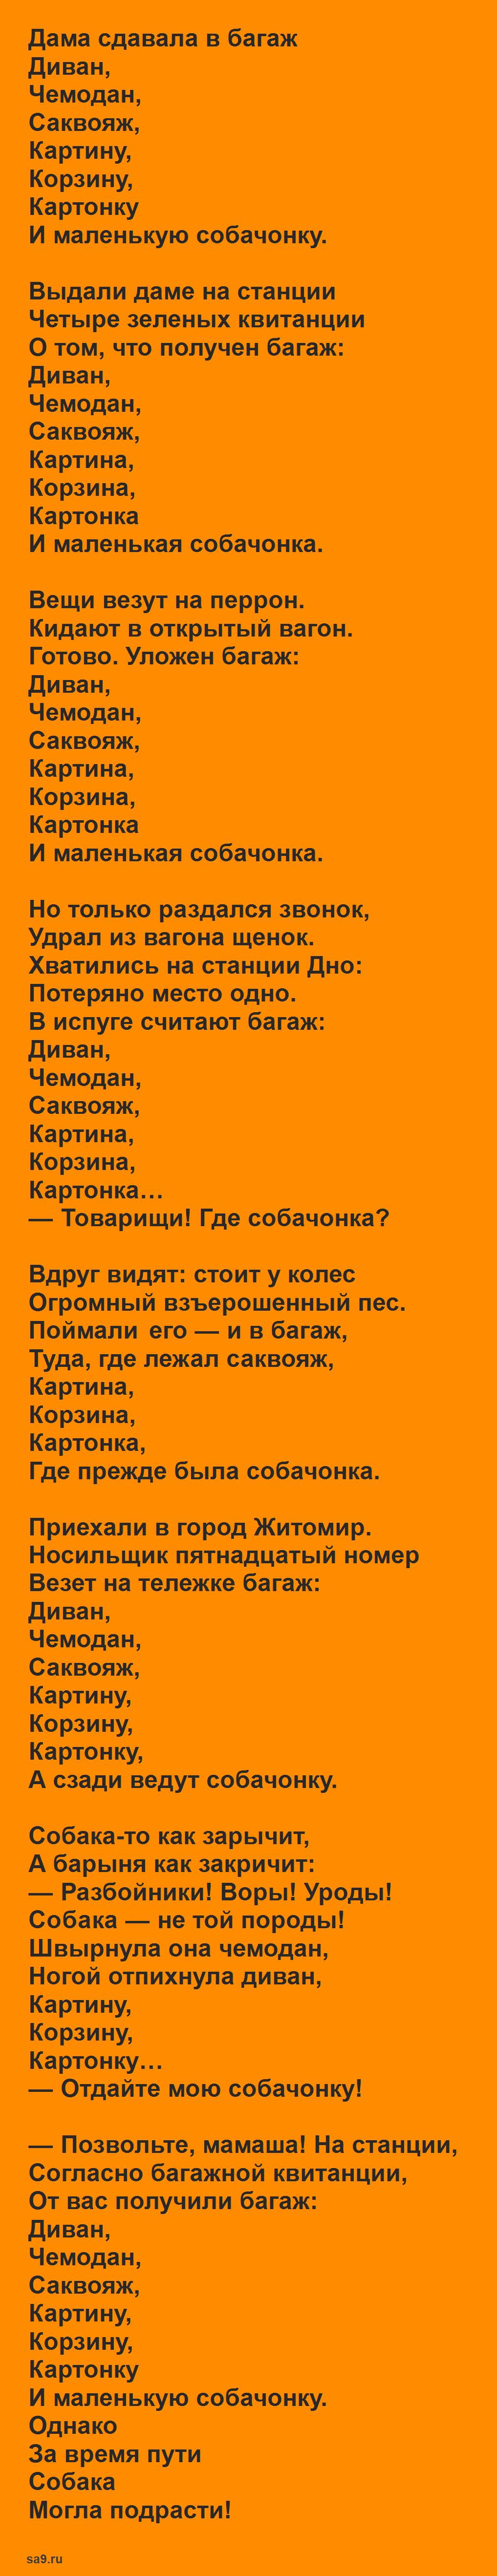 Стих Маршака - Багаж